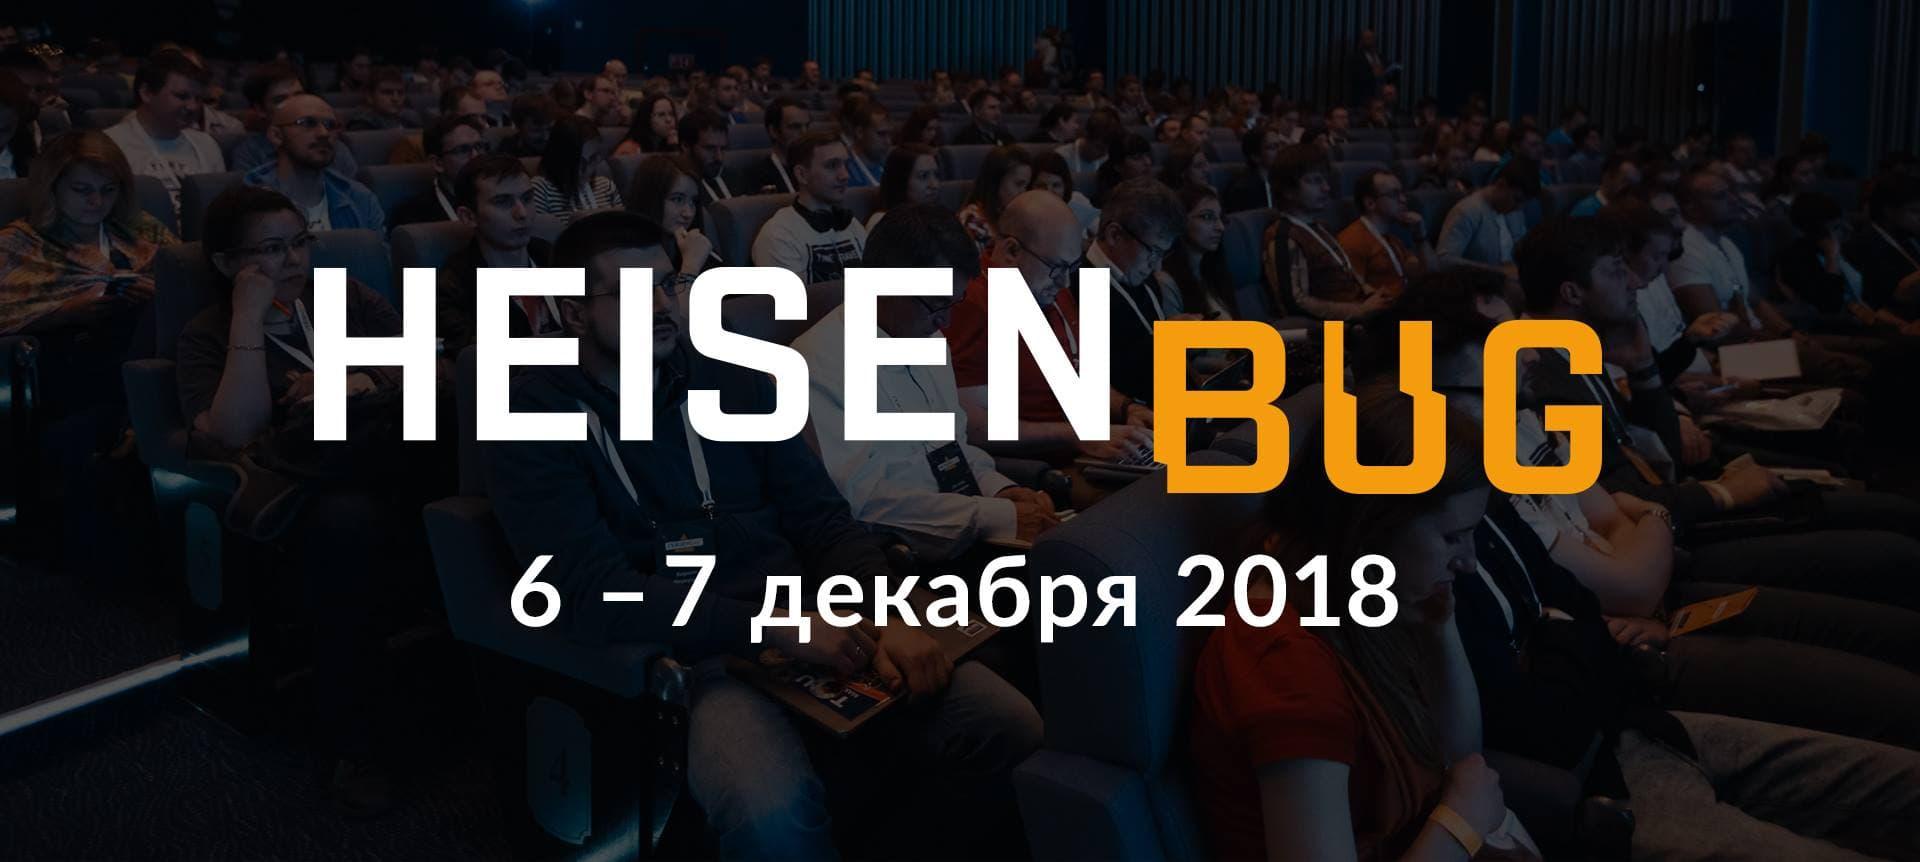 Heisenbug 2018 Moscow